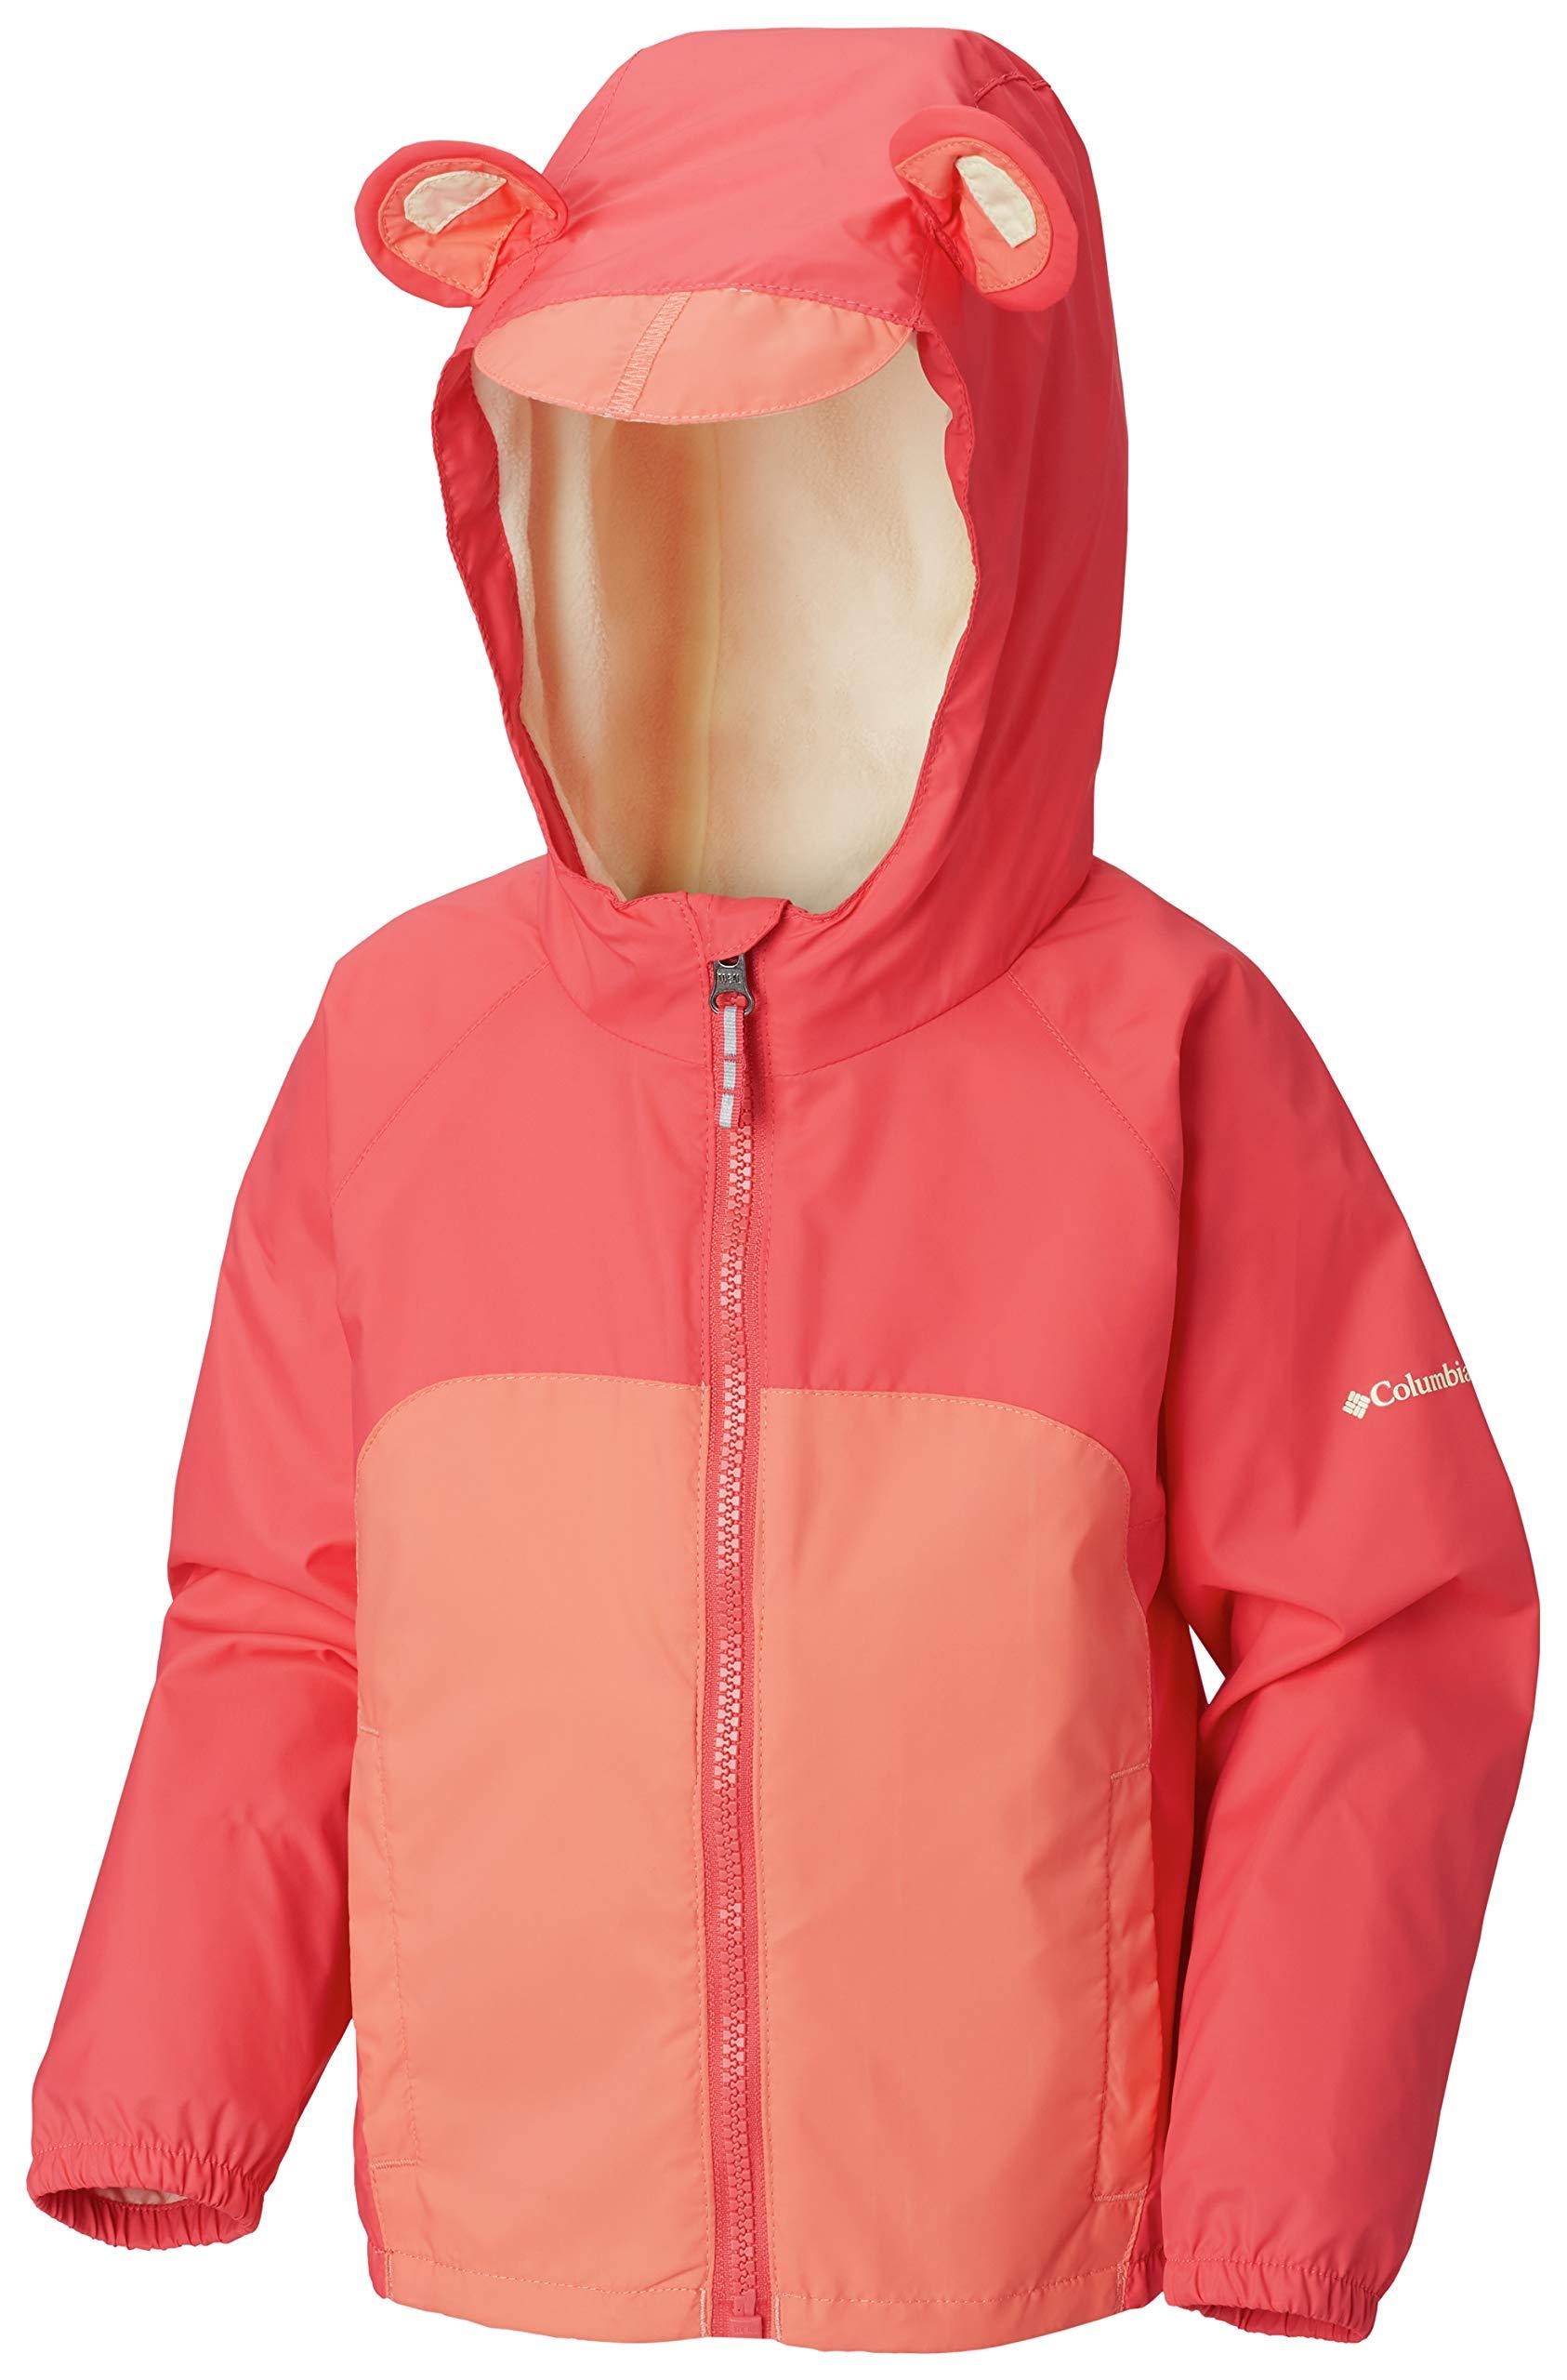 Columbia Kids Baby Girl's Kitteribbit¿ Fleece Lined Rain Jacket (Infant/Toddler) Bright Geranium/Hot Coral/Lime Freeze 12-18 Months